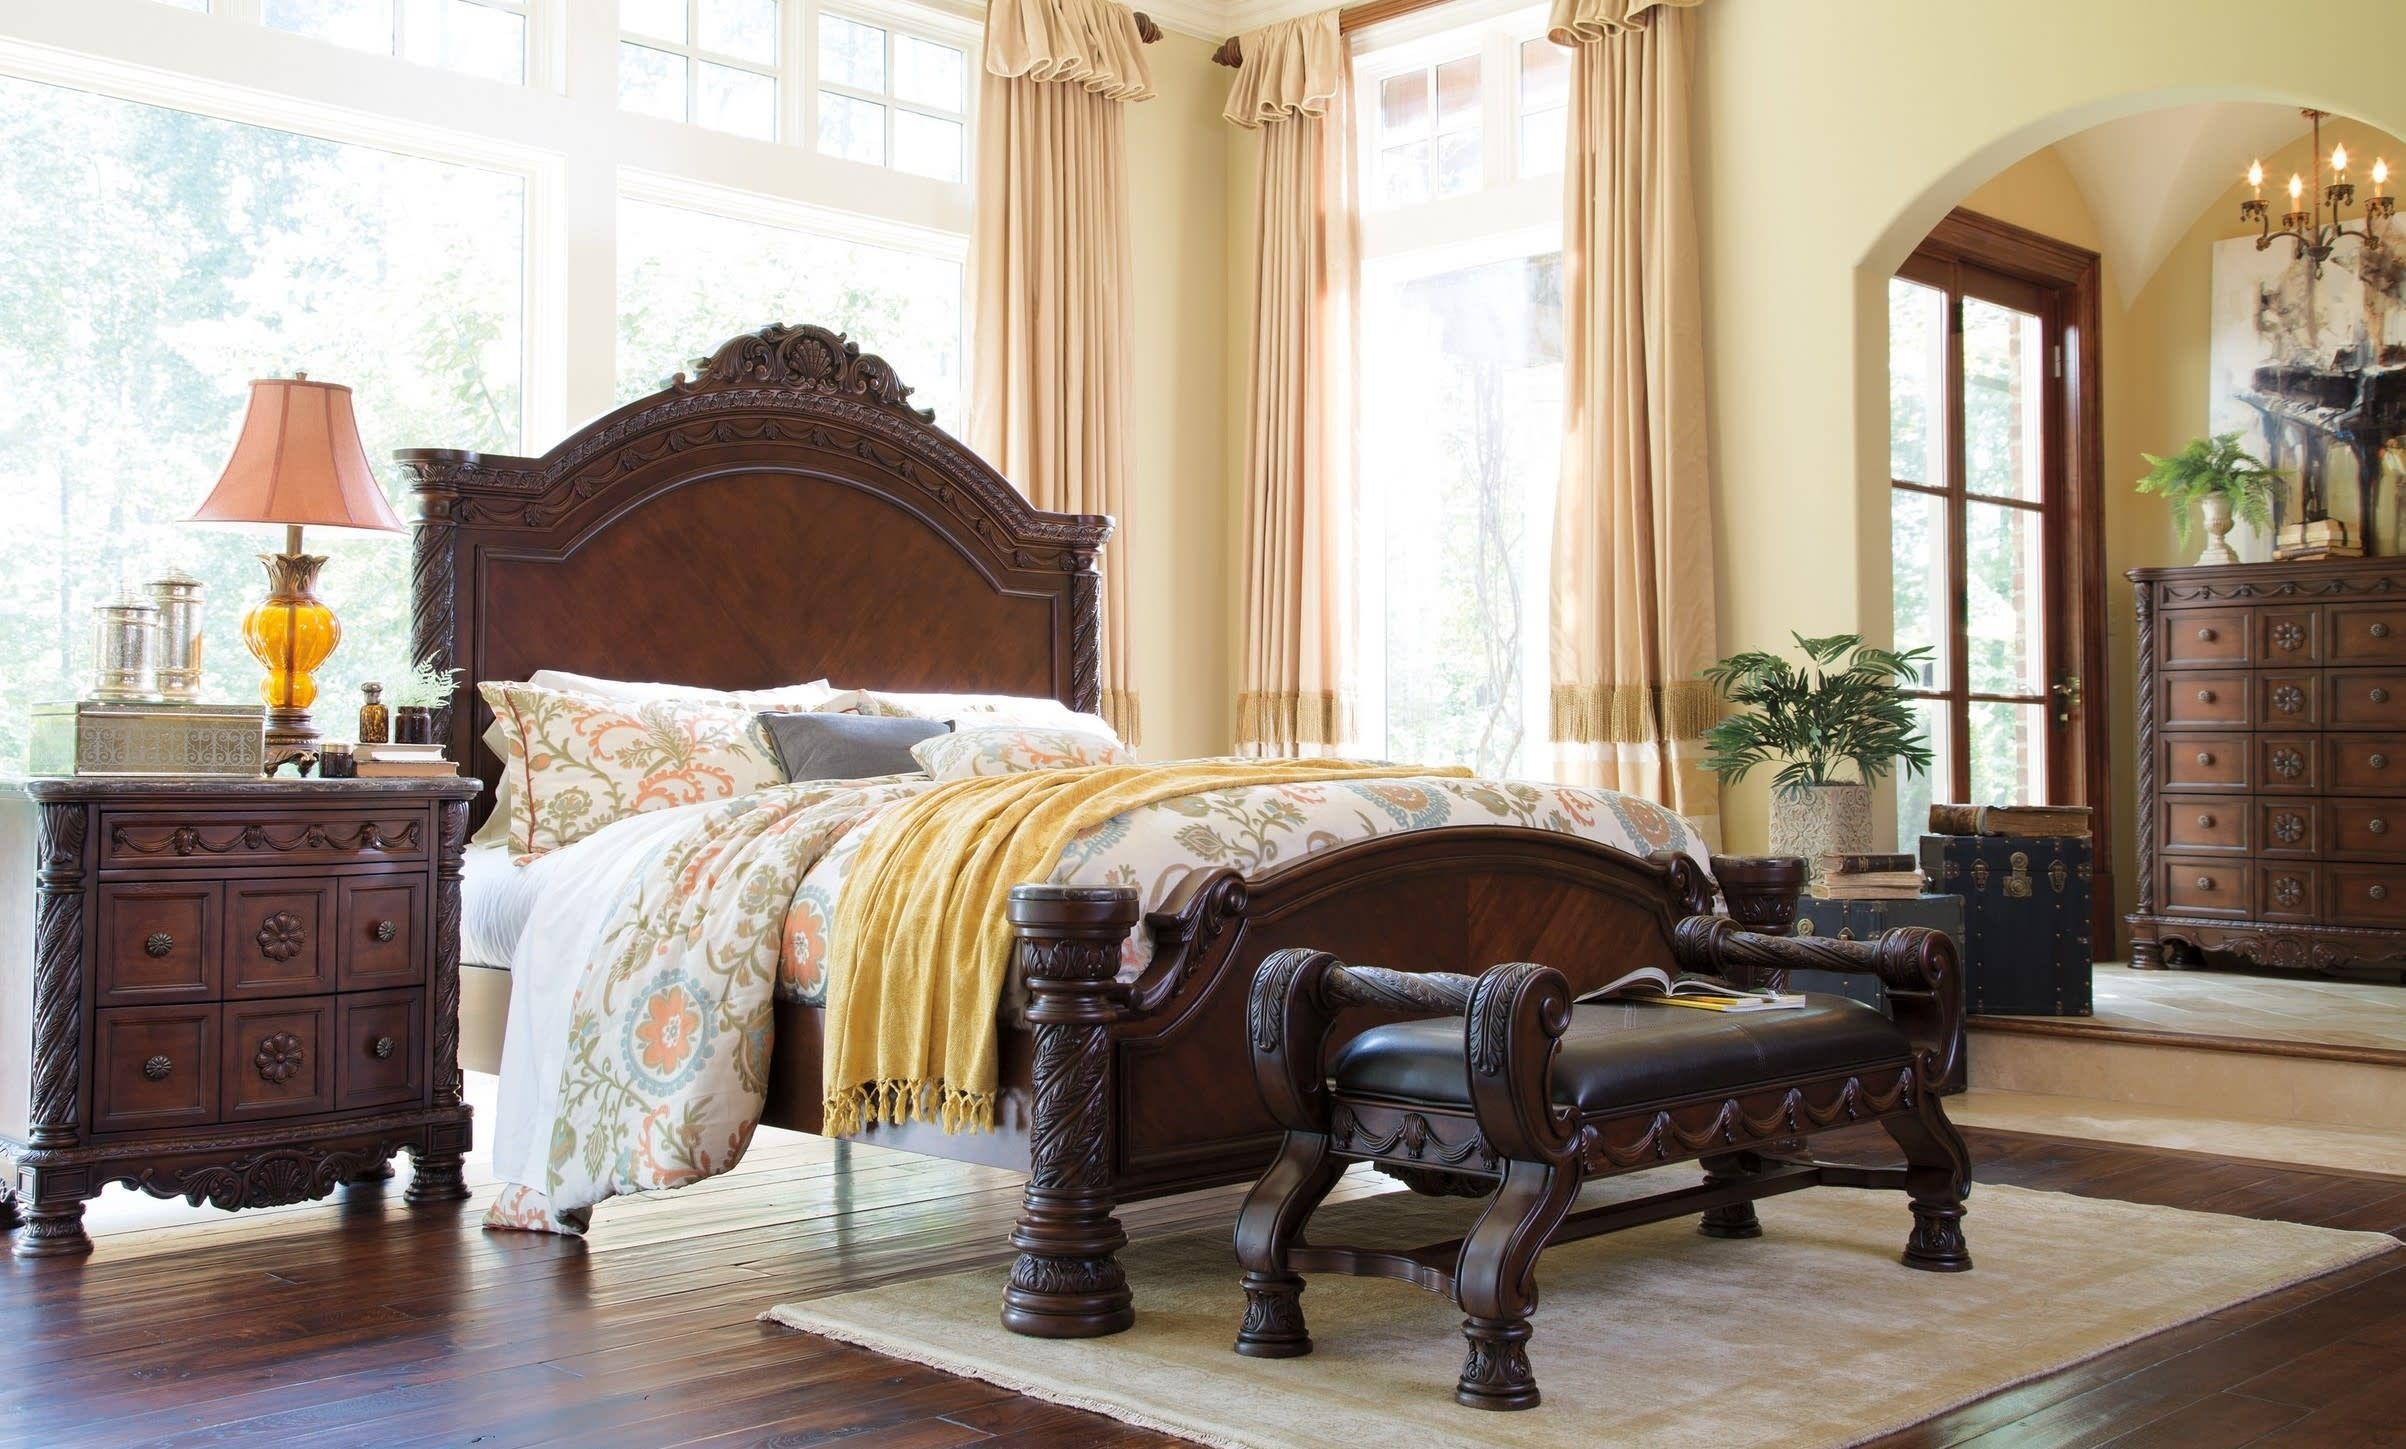 North Shore Bedroom Set Sale in 2020 Upholstered bench